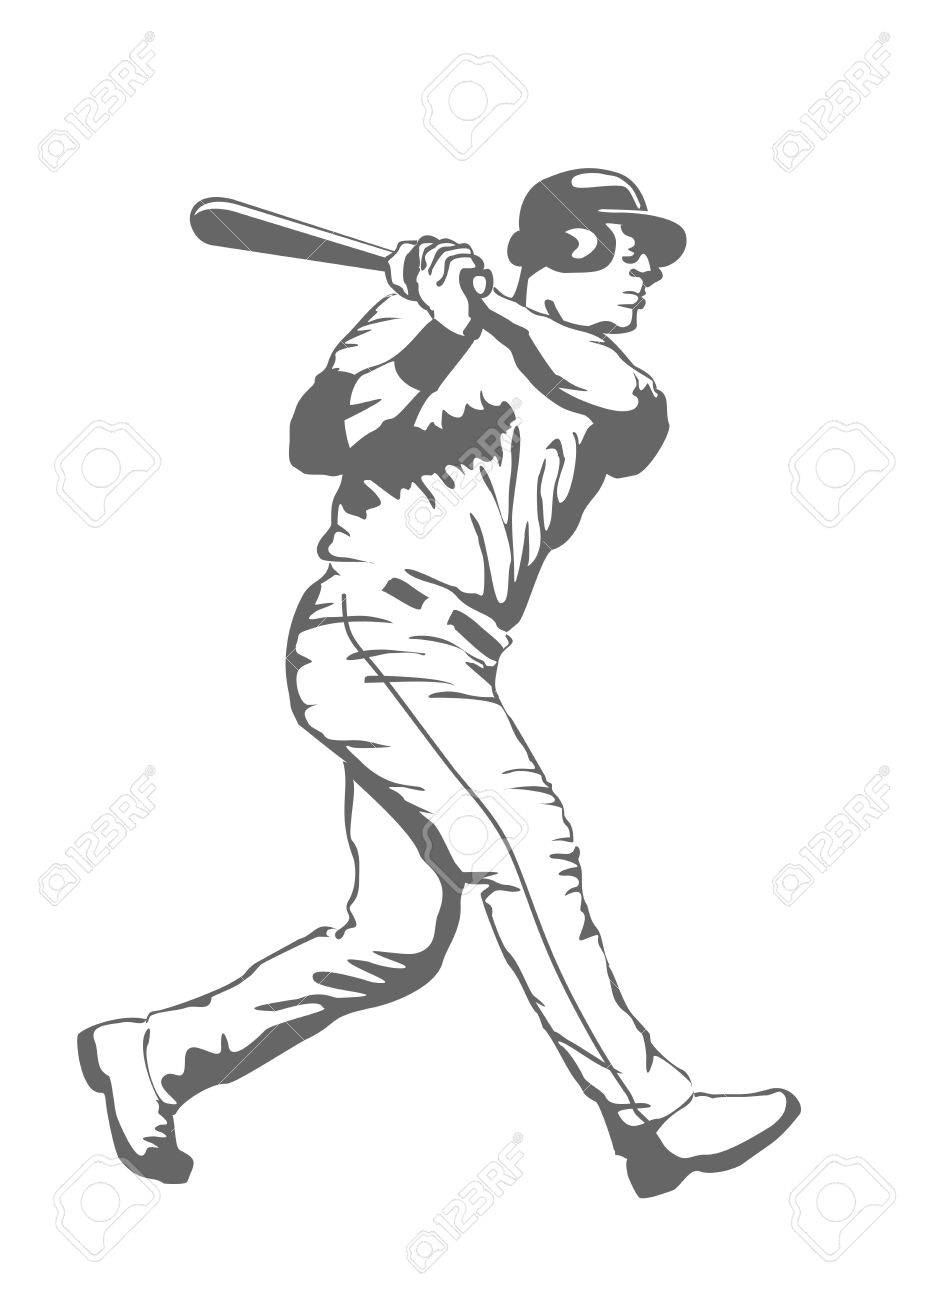 teen-close-baseball-player-swinging-a-bat-will-sex